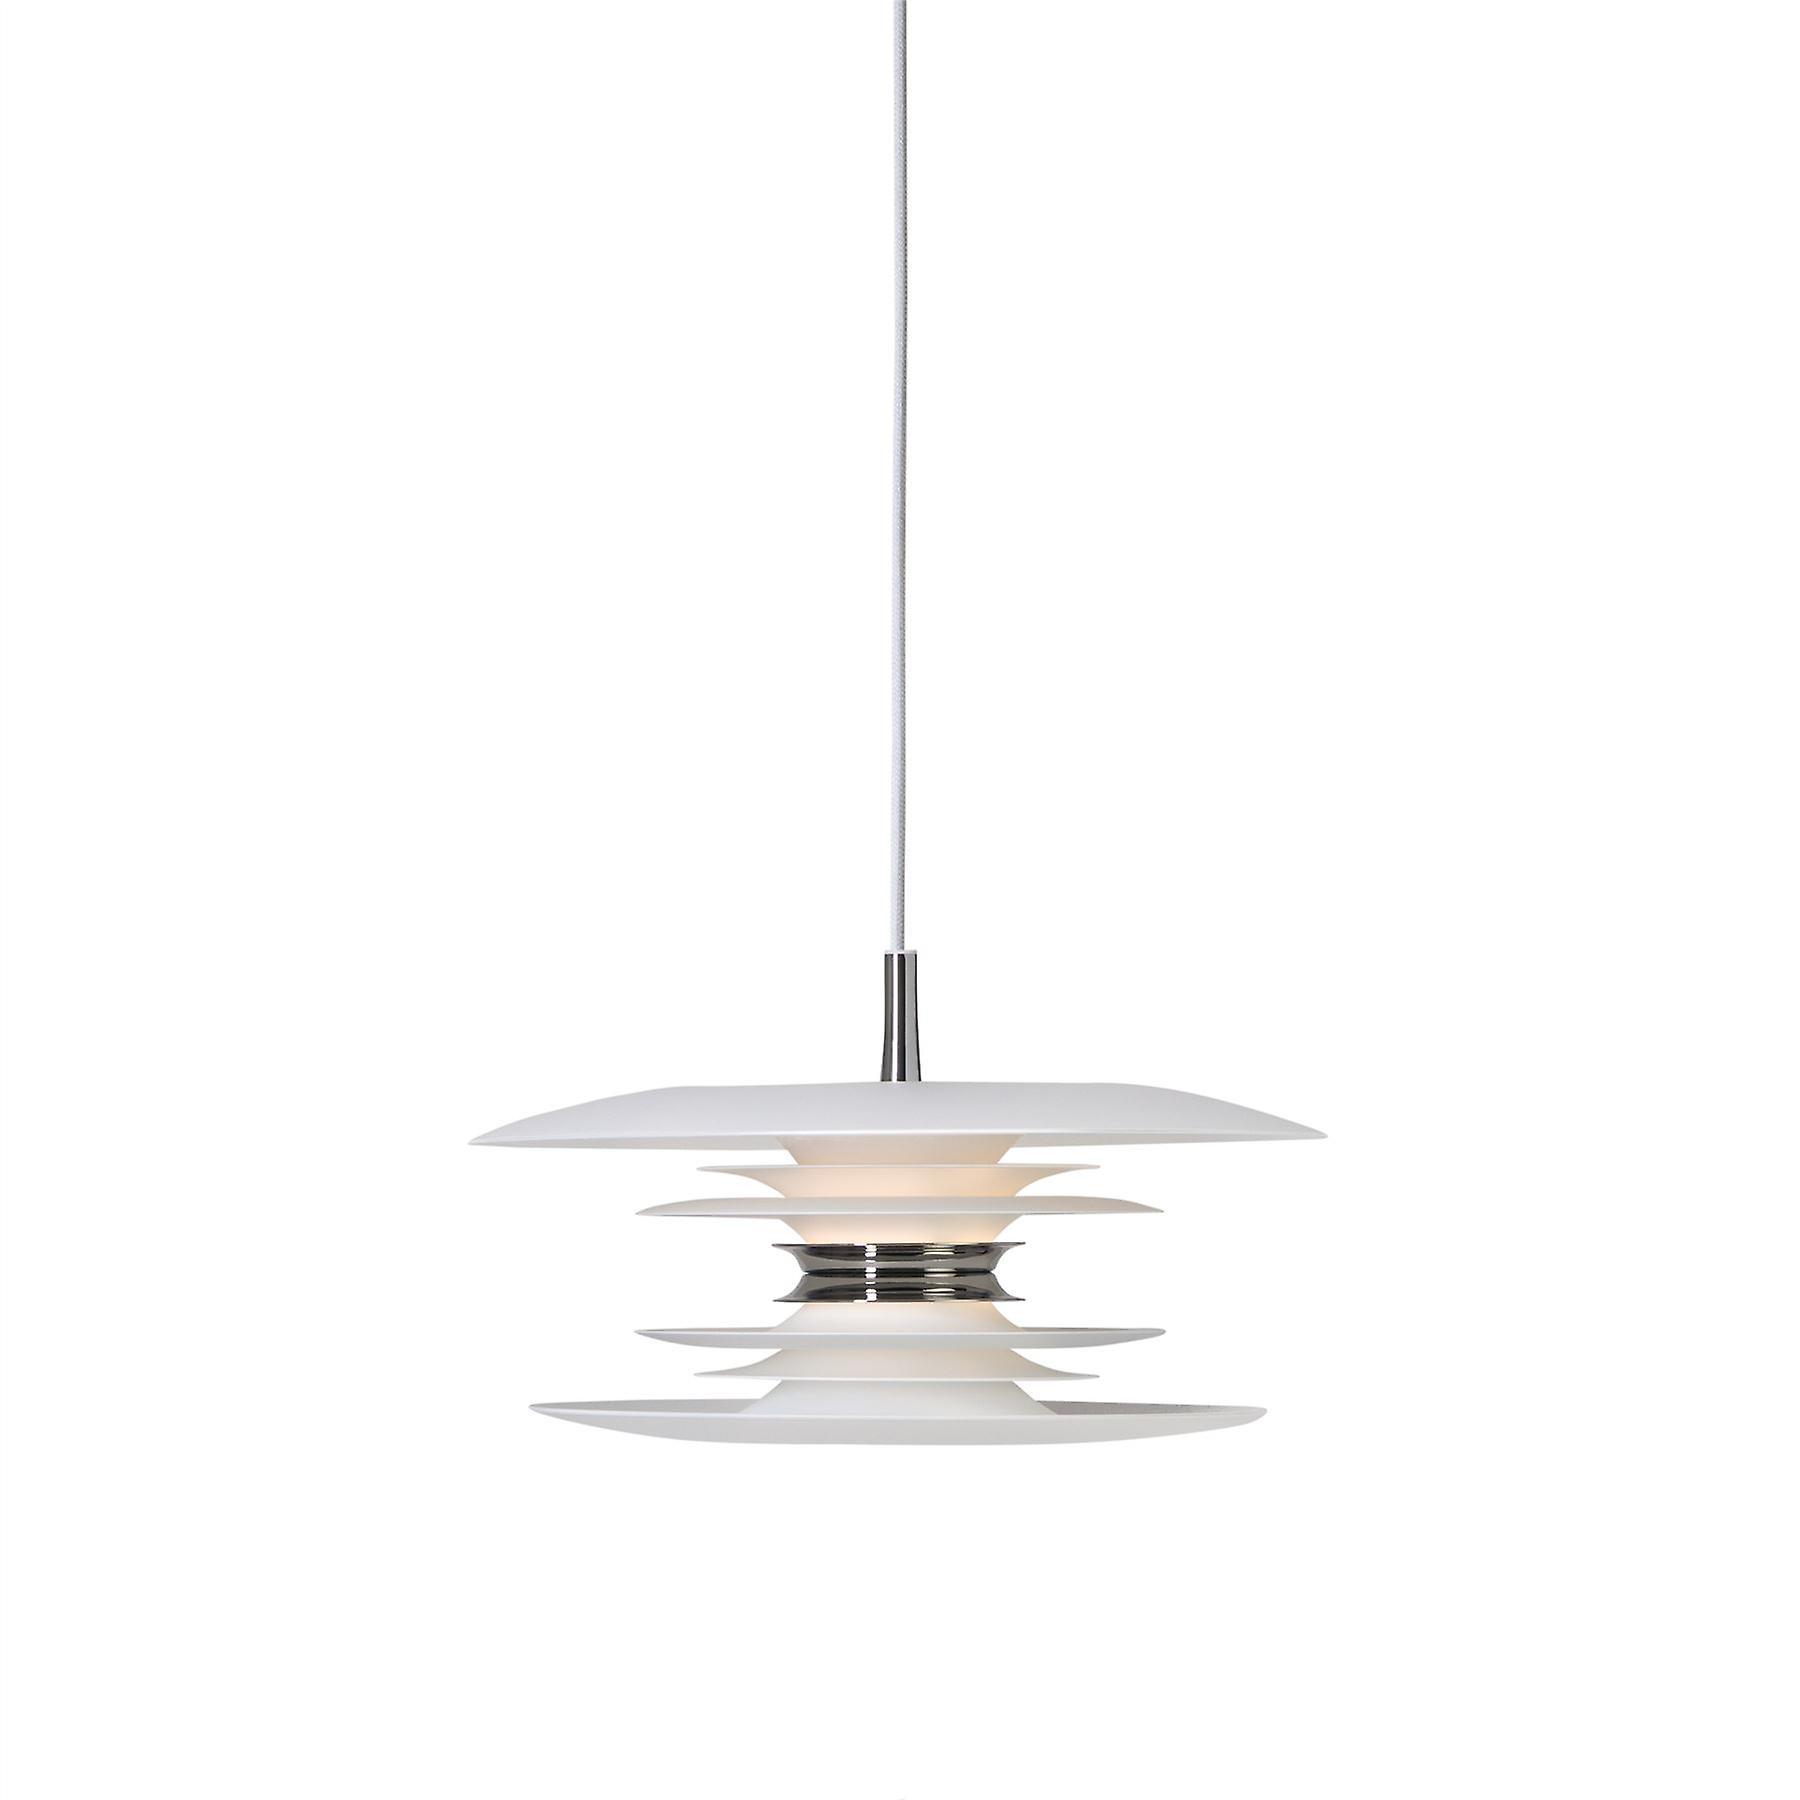 Belid - Diablo LED pendentif lumière Matt blanc Finish 144436